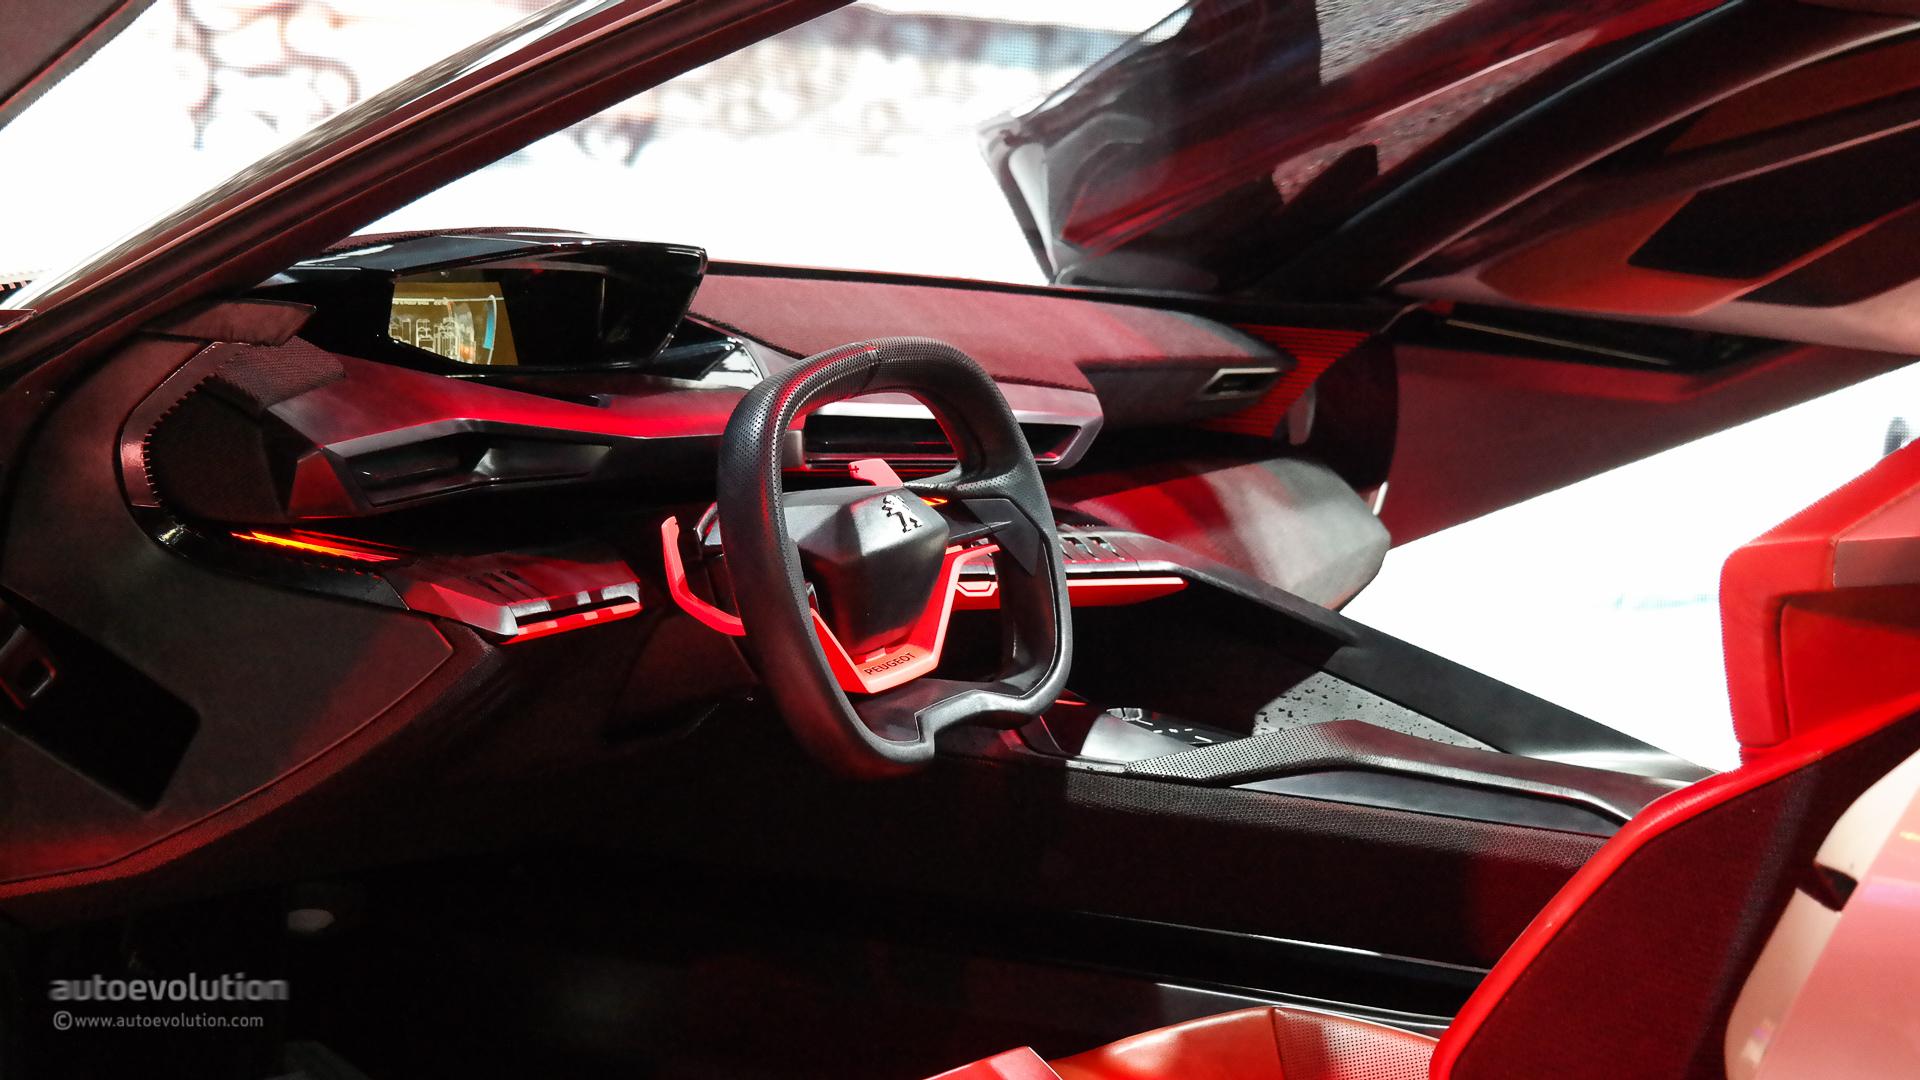 500 Hp Peugeot Quartz Concept Previews Future French Suv